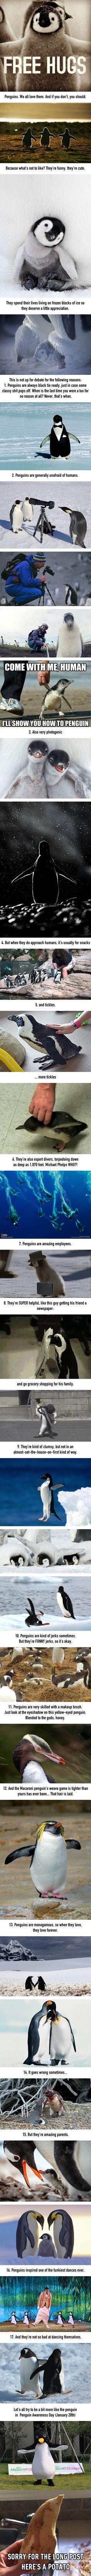 17 Reasons To Celebrate Penguin Awareness Day